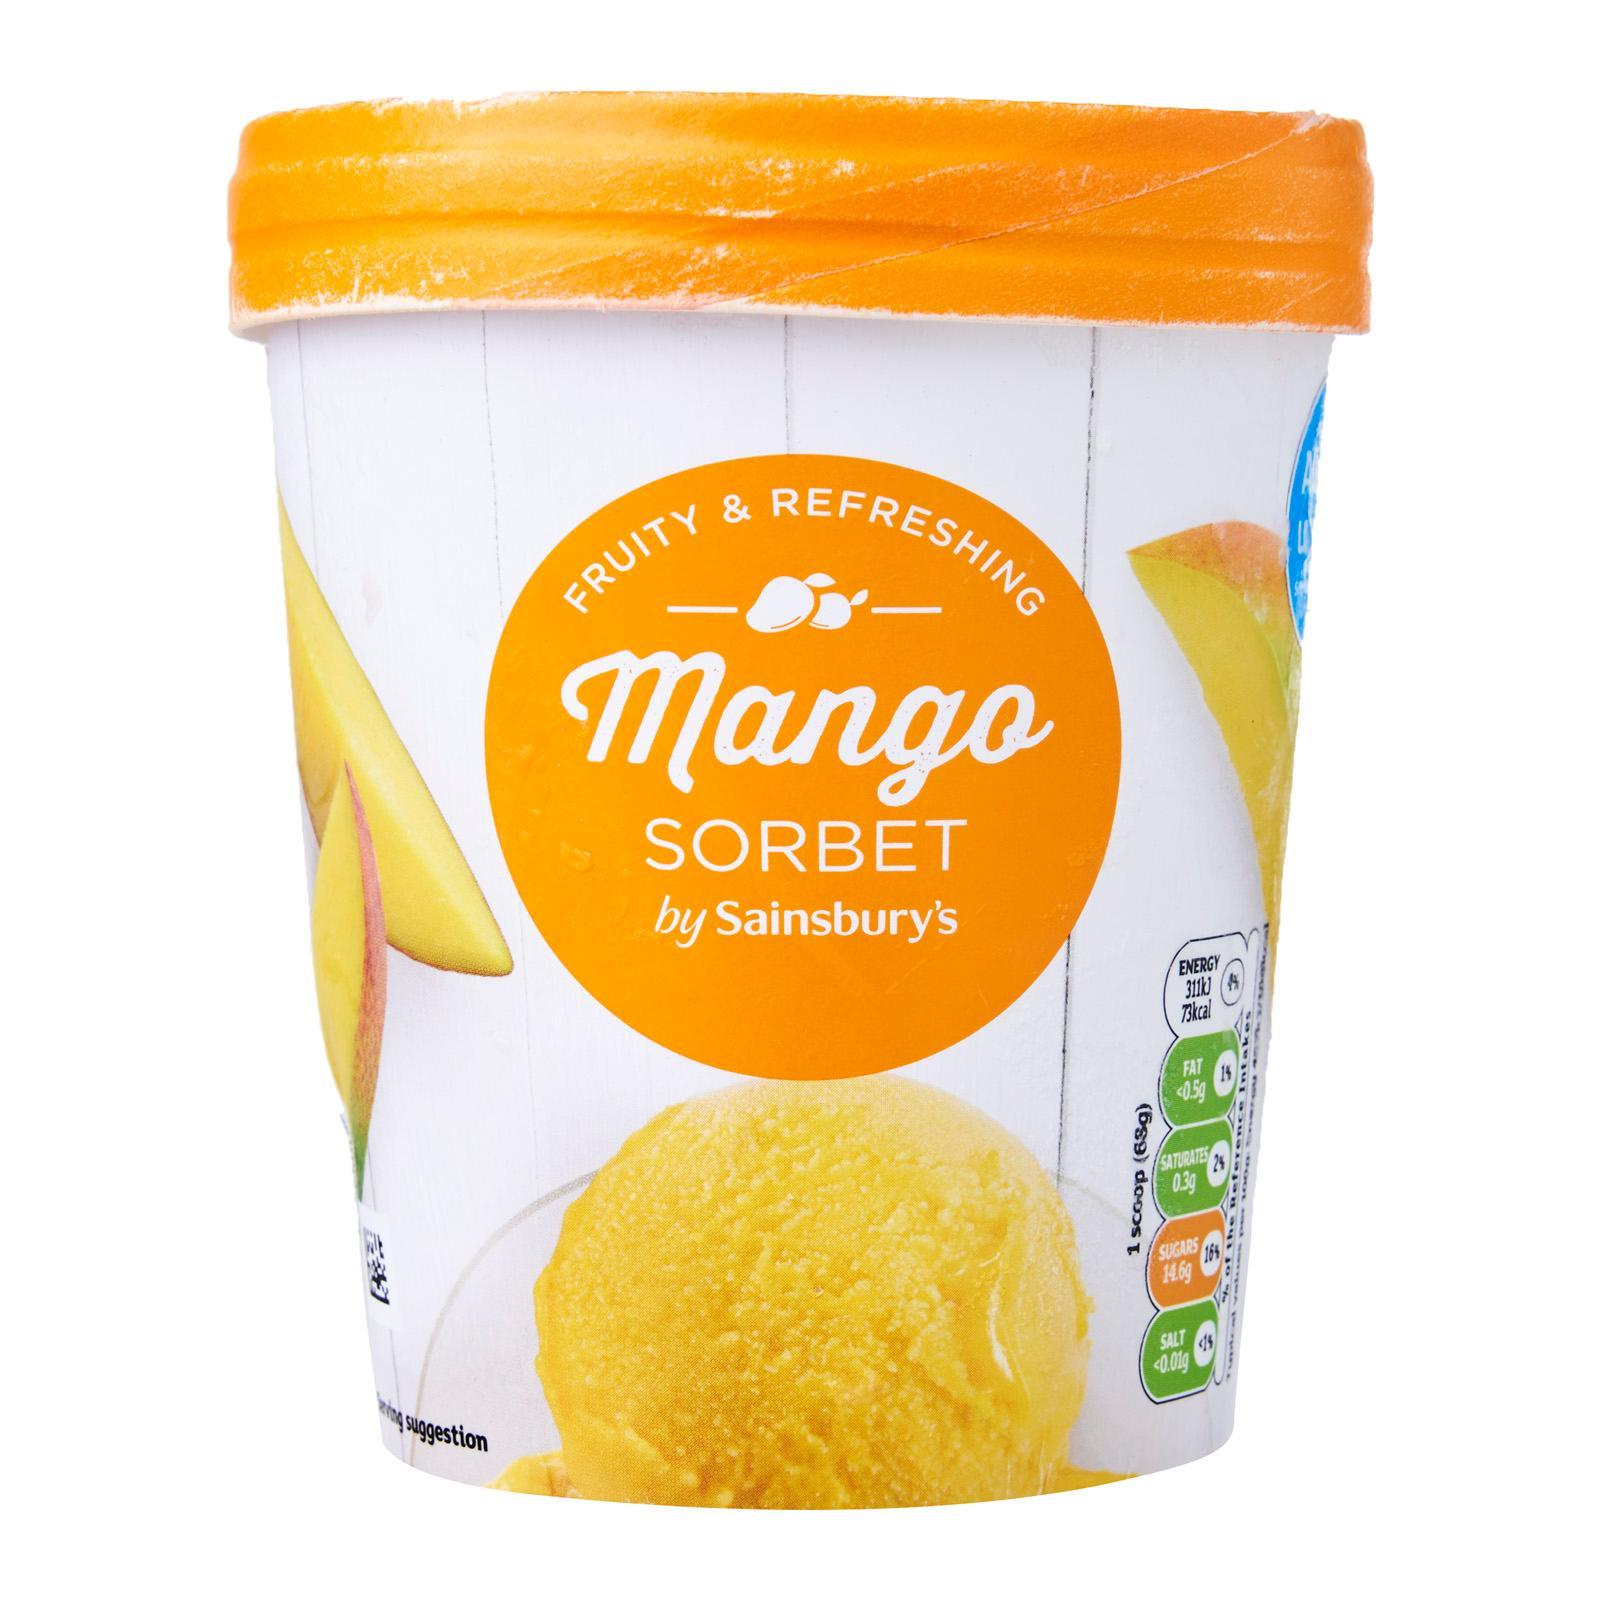 Sainsbury's Mango Sorbet - Frozen